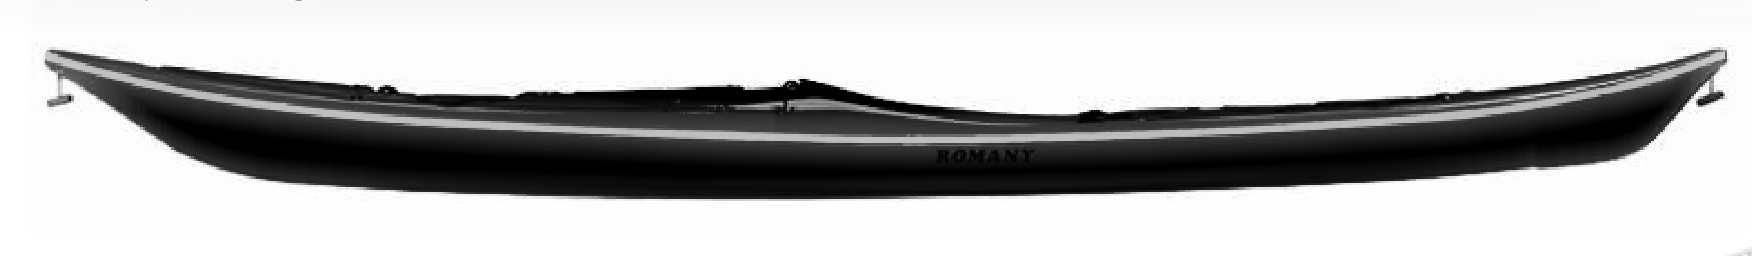 NDK Romany Classic Carbon Kevlar